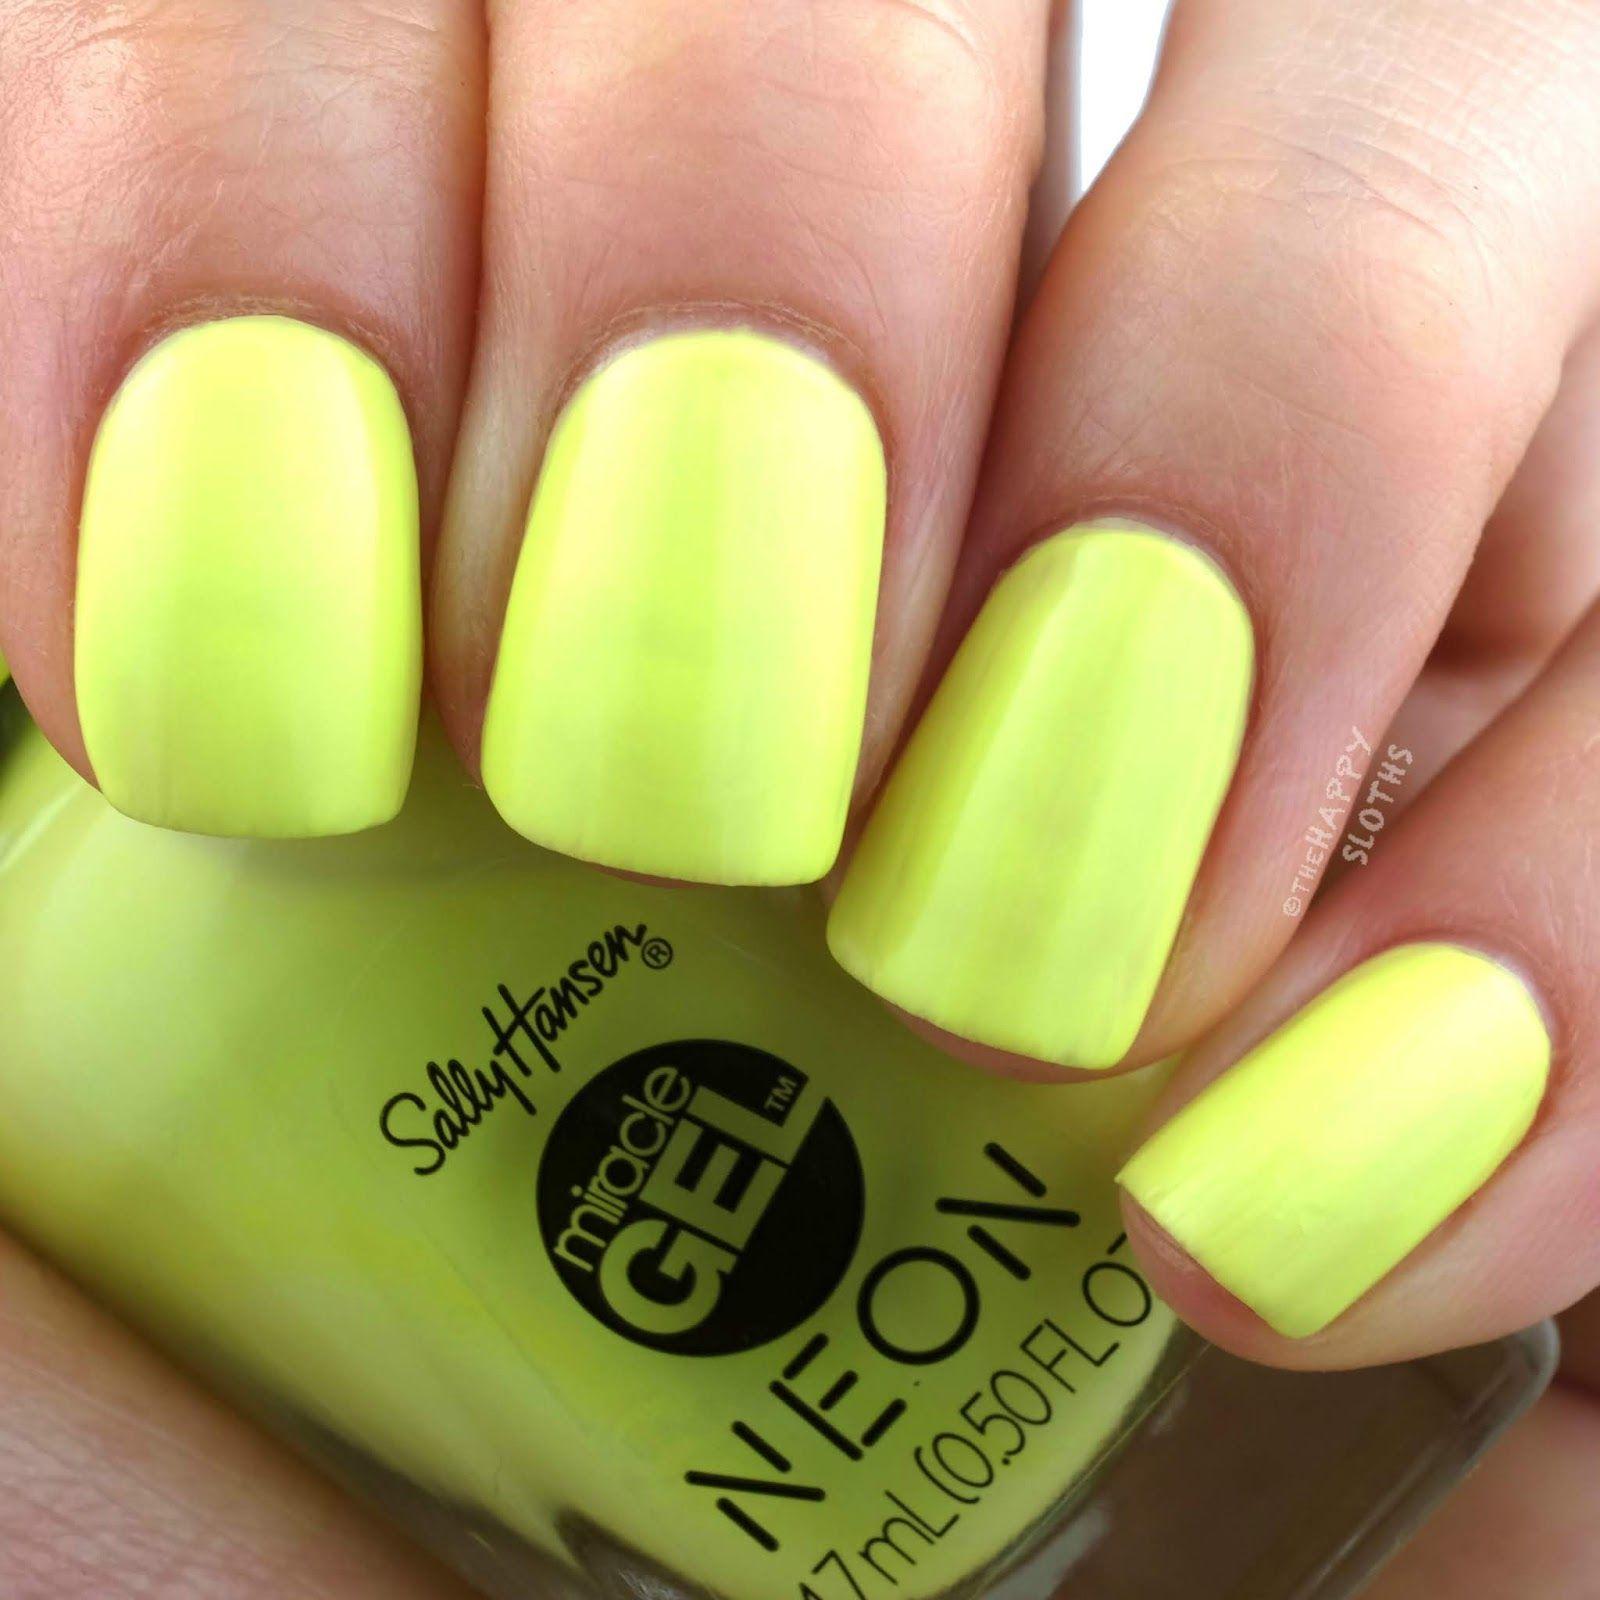 Sally Hansen Fan Faves Sally Hansen Neon Nail Polish Gel Nails